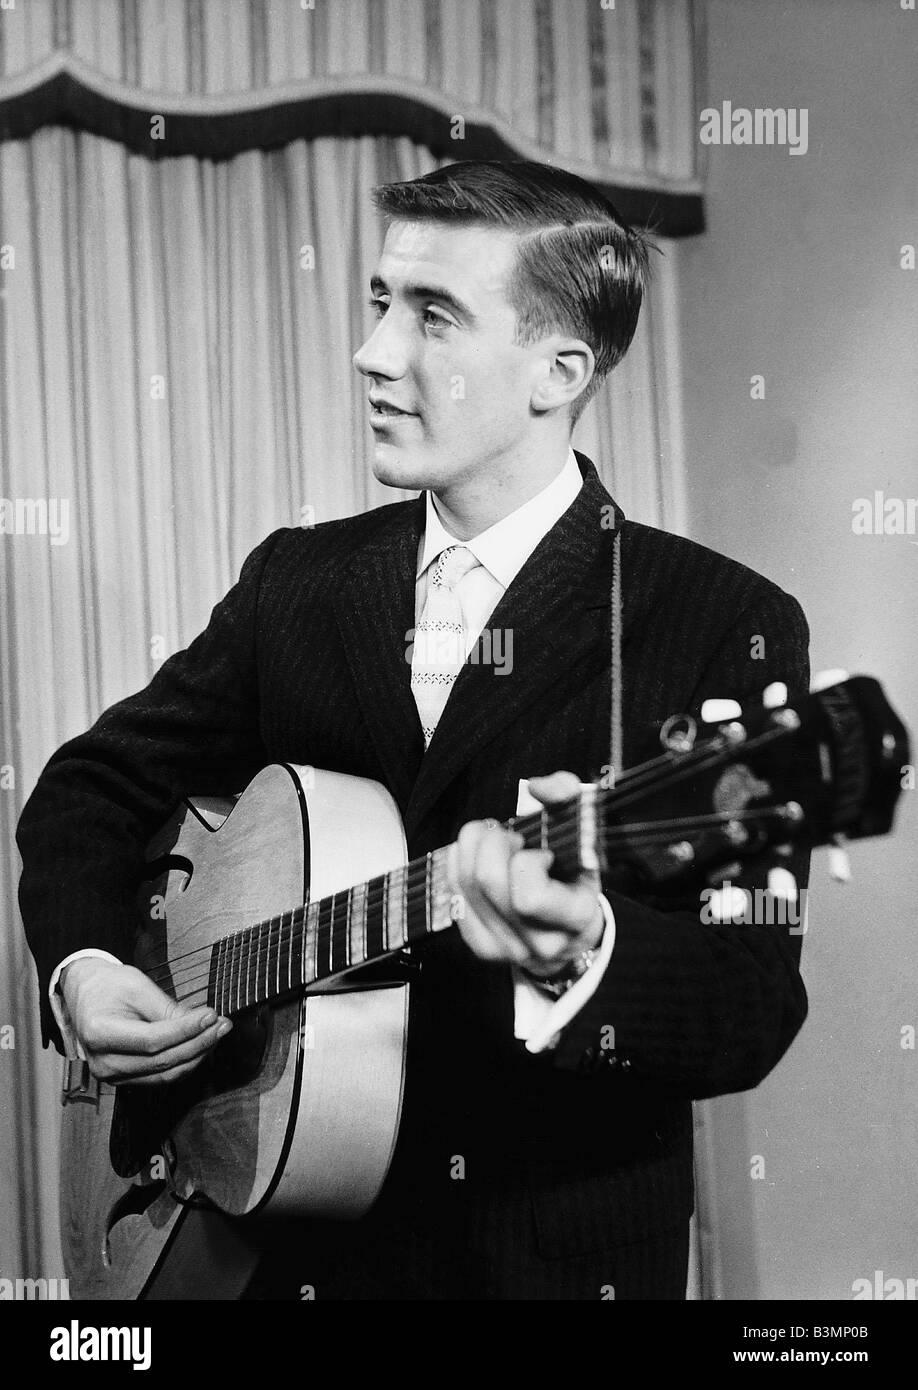 Roy Castle TV presenter Stock Photo: 19510635 - Alamy